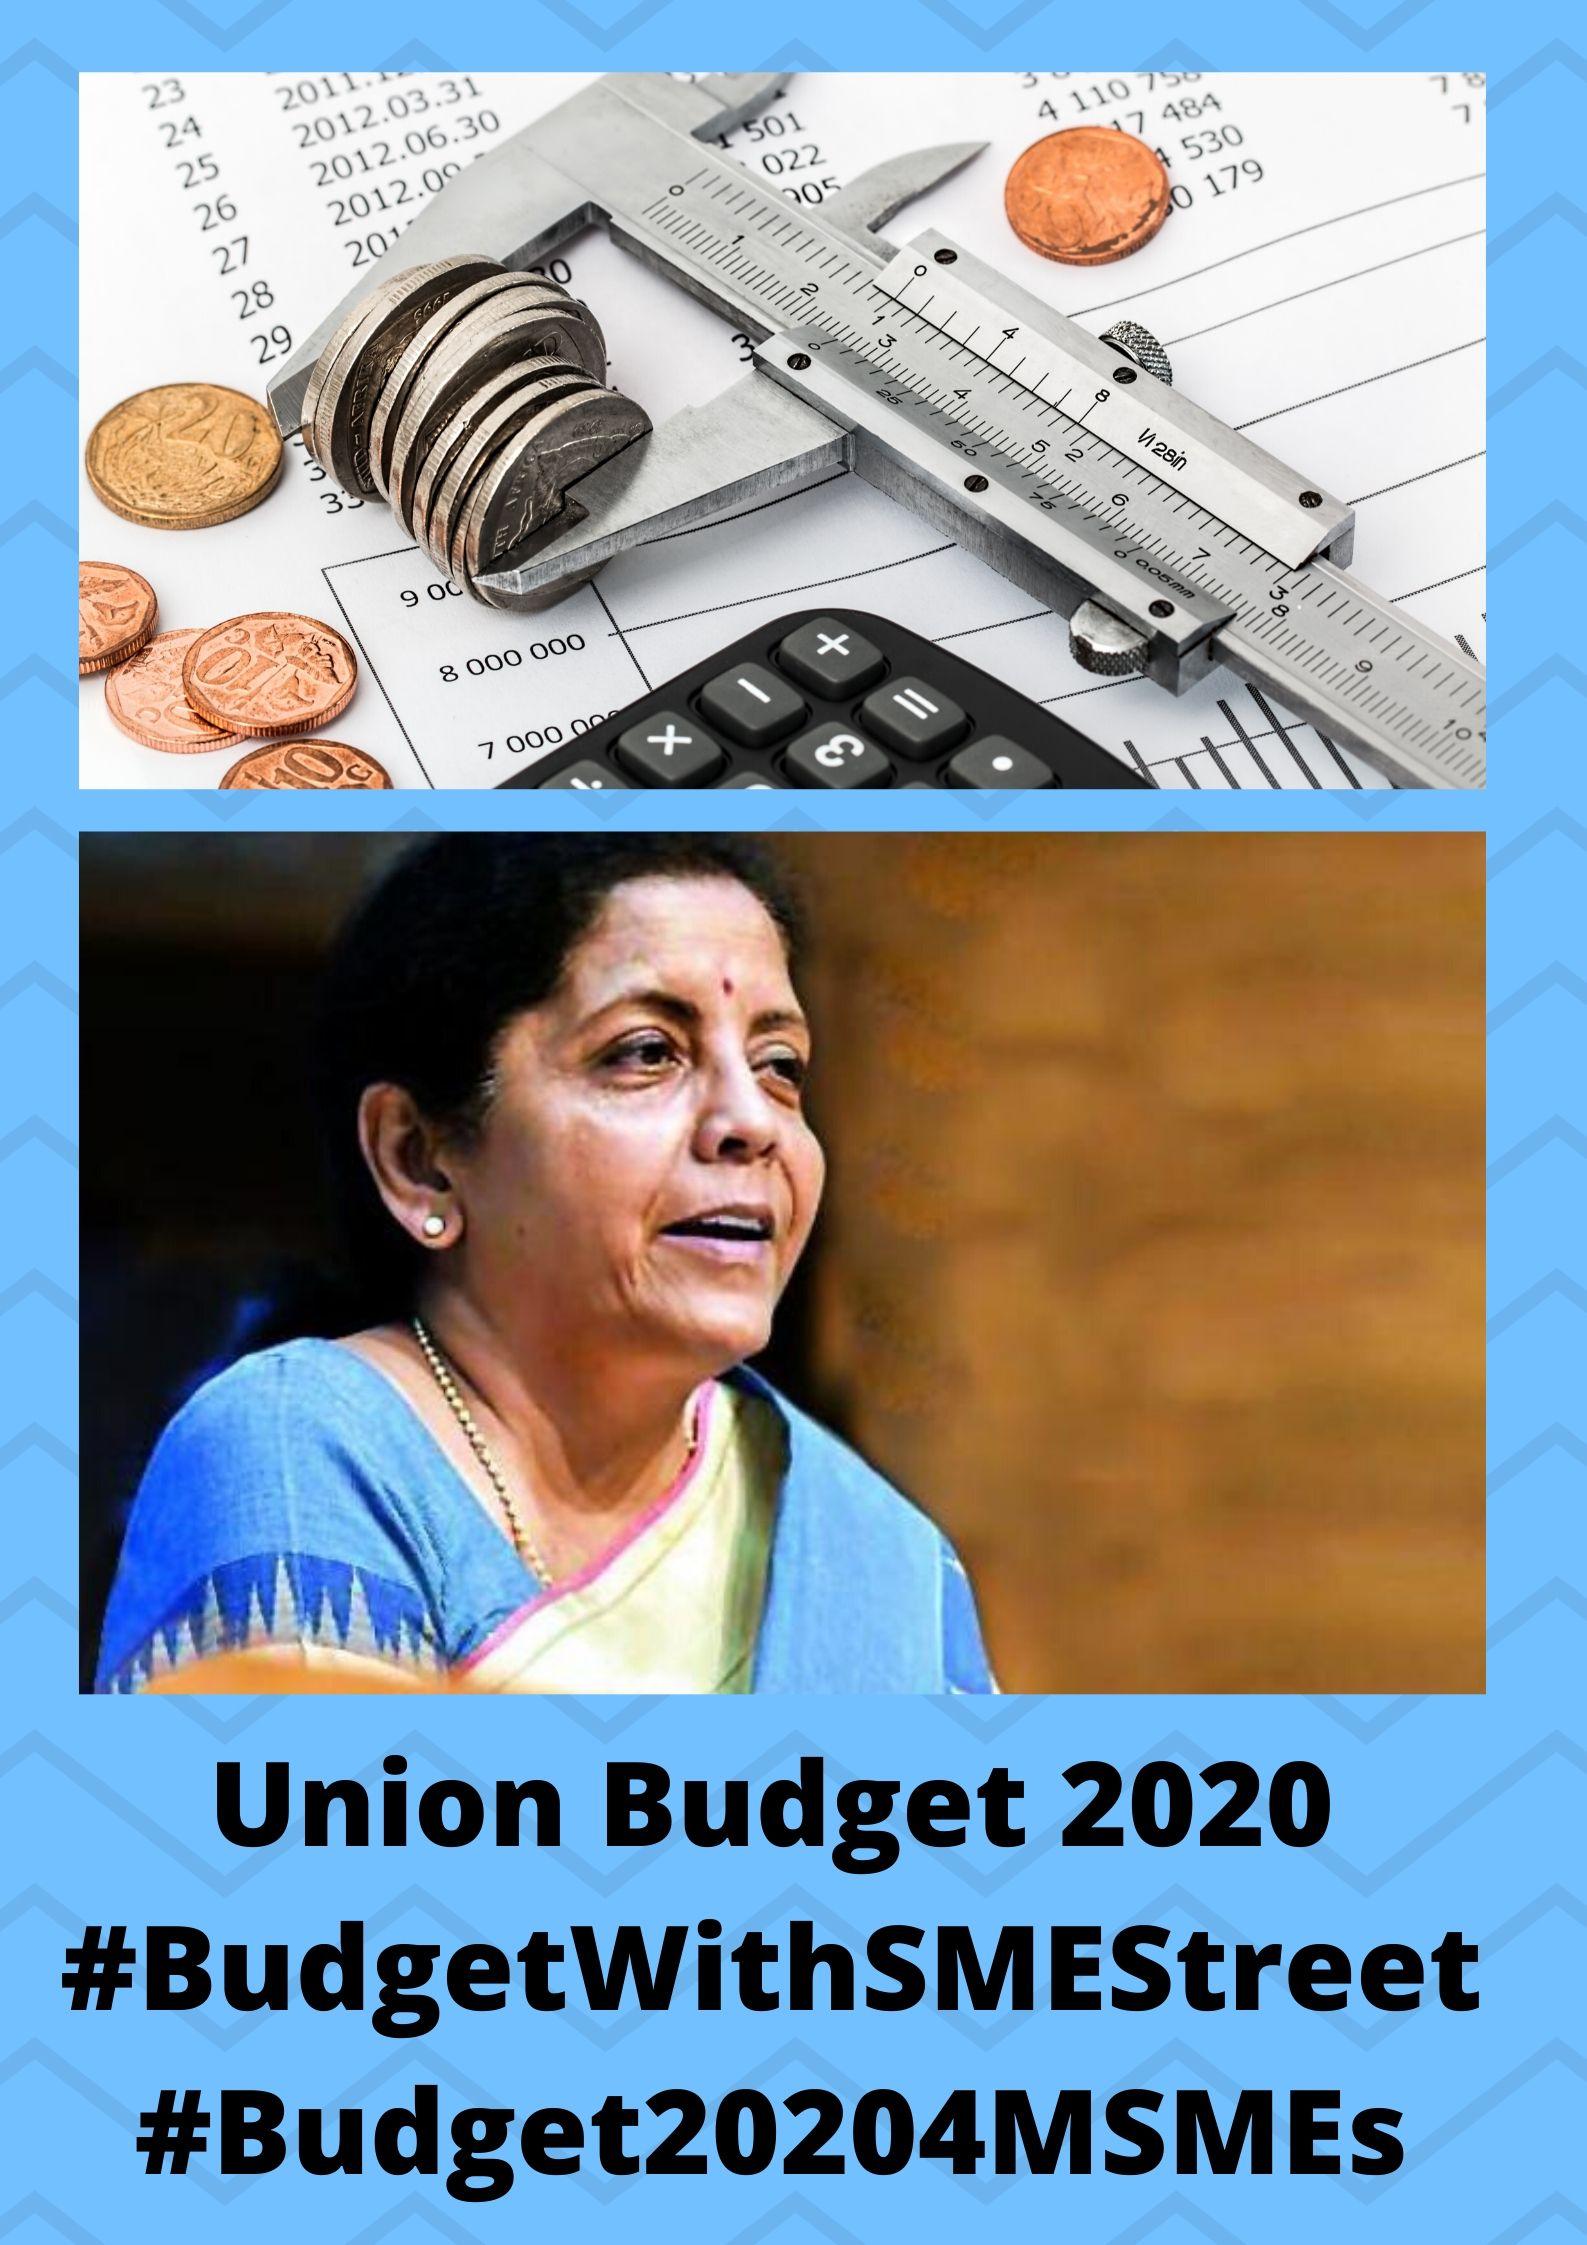 Union Budget 2020 #BudgetWithSMEStreet #Budget20204MSMEs